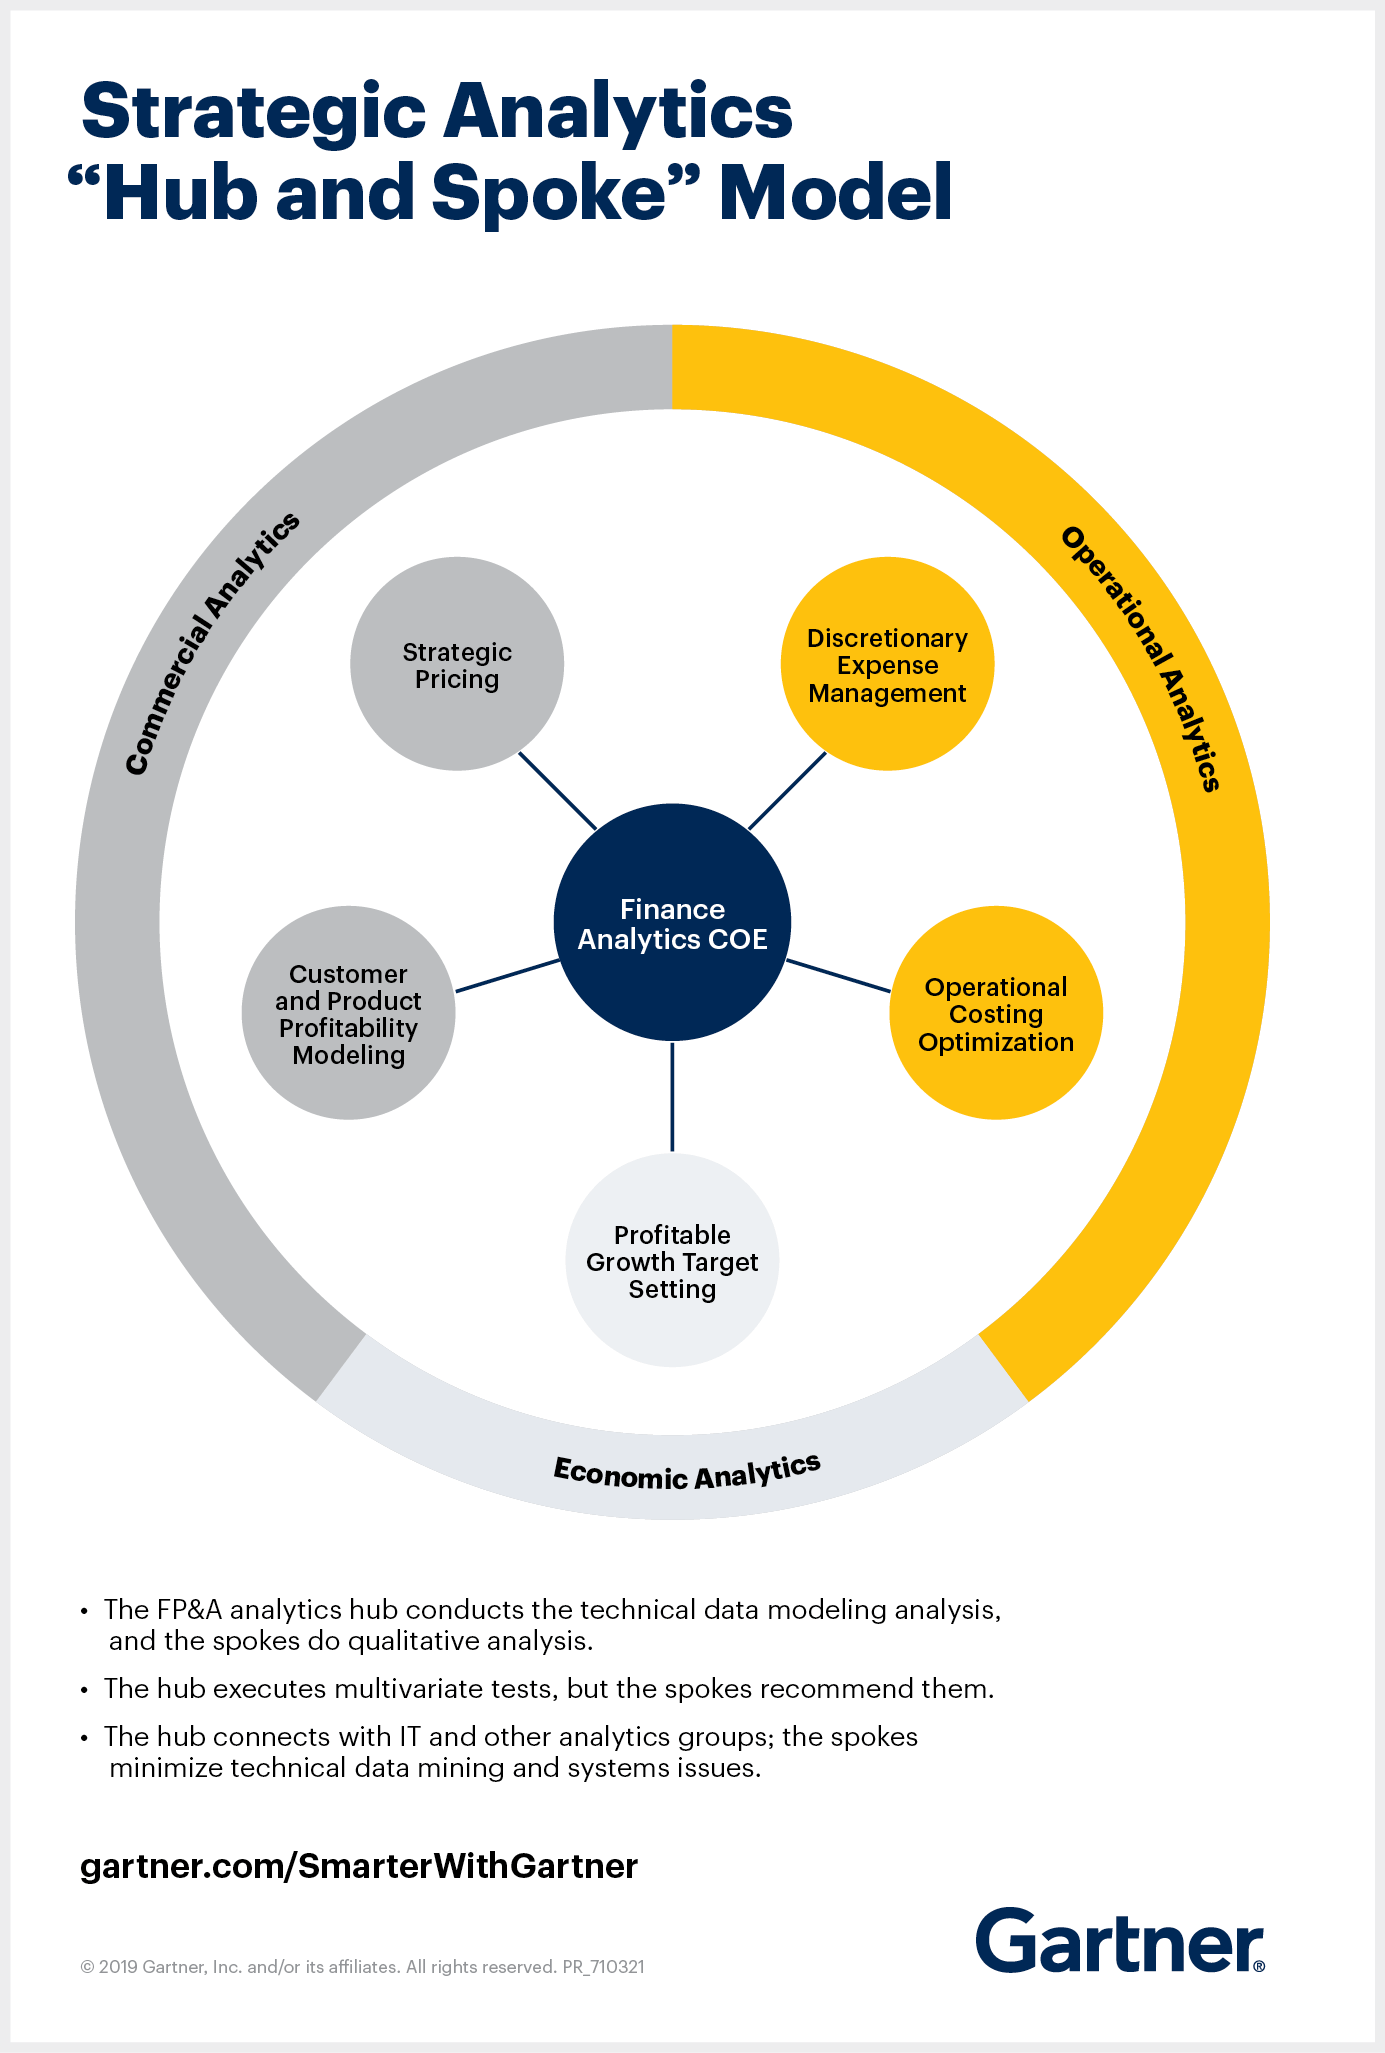 Strategic Analytics Hub and Spoke Model.png